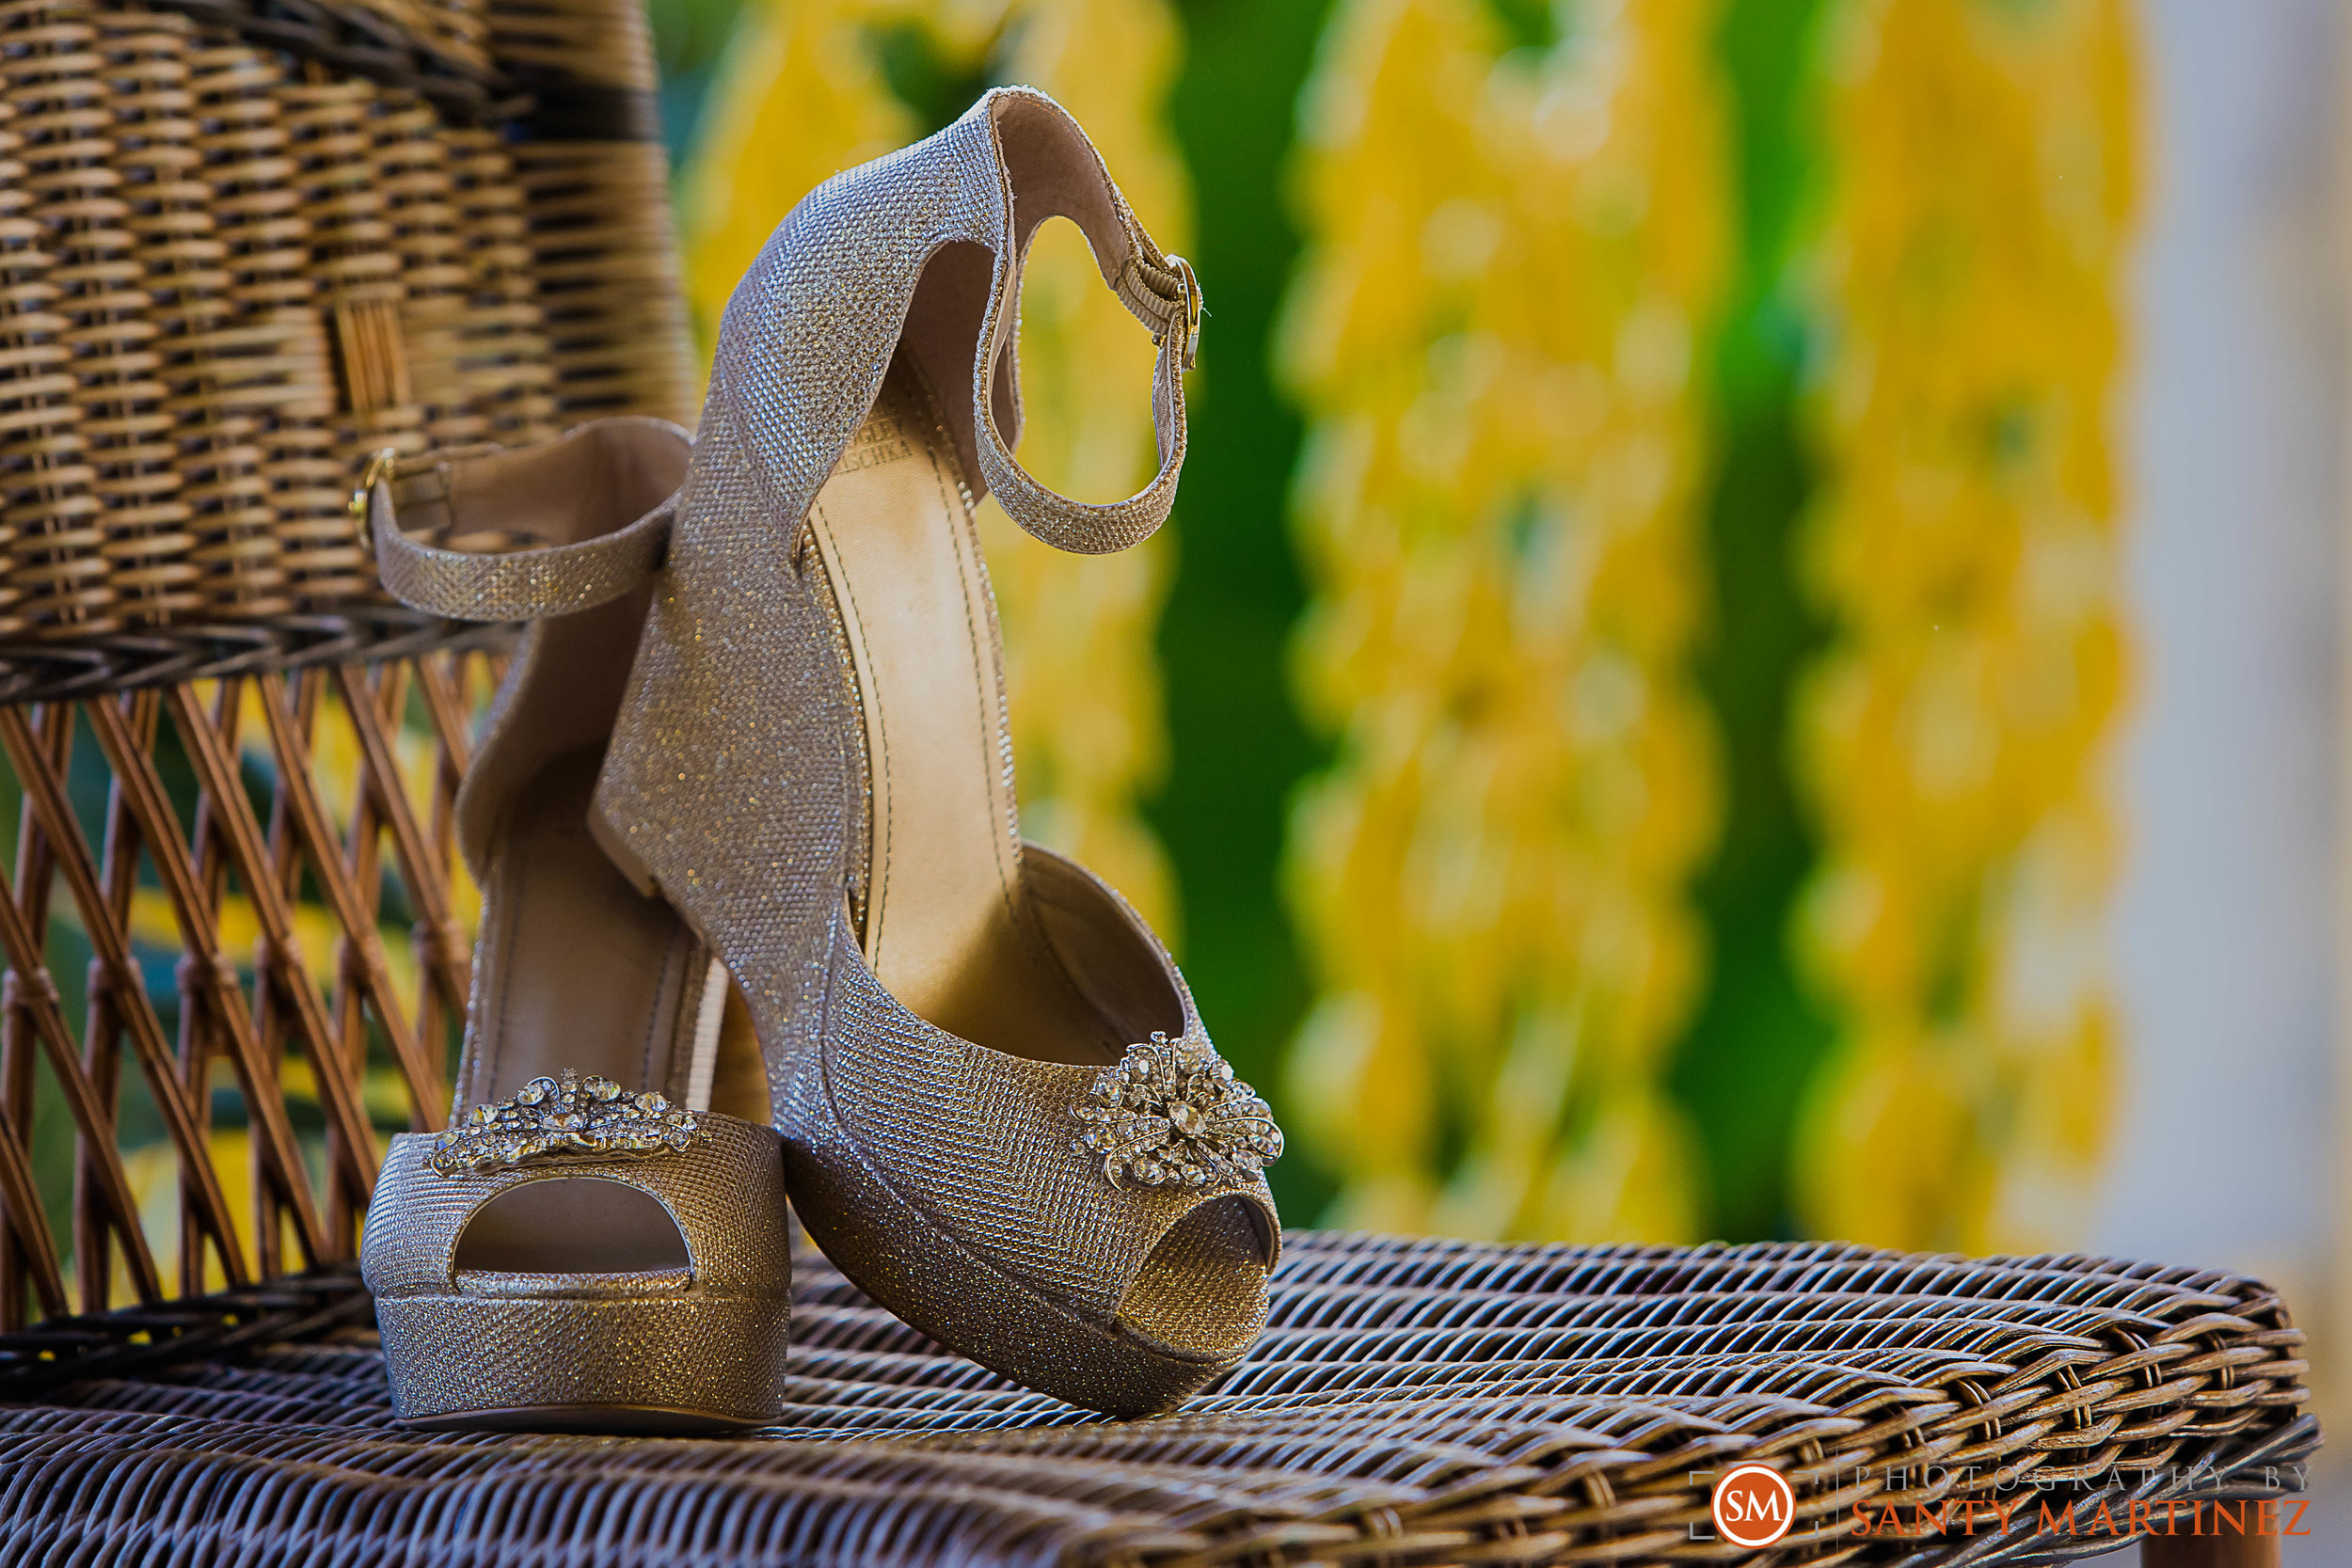 Wedding Bonnet House - Photography by Santy Martinez-2.jpg